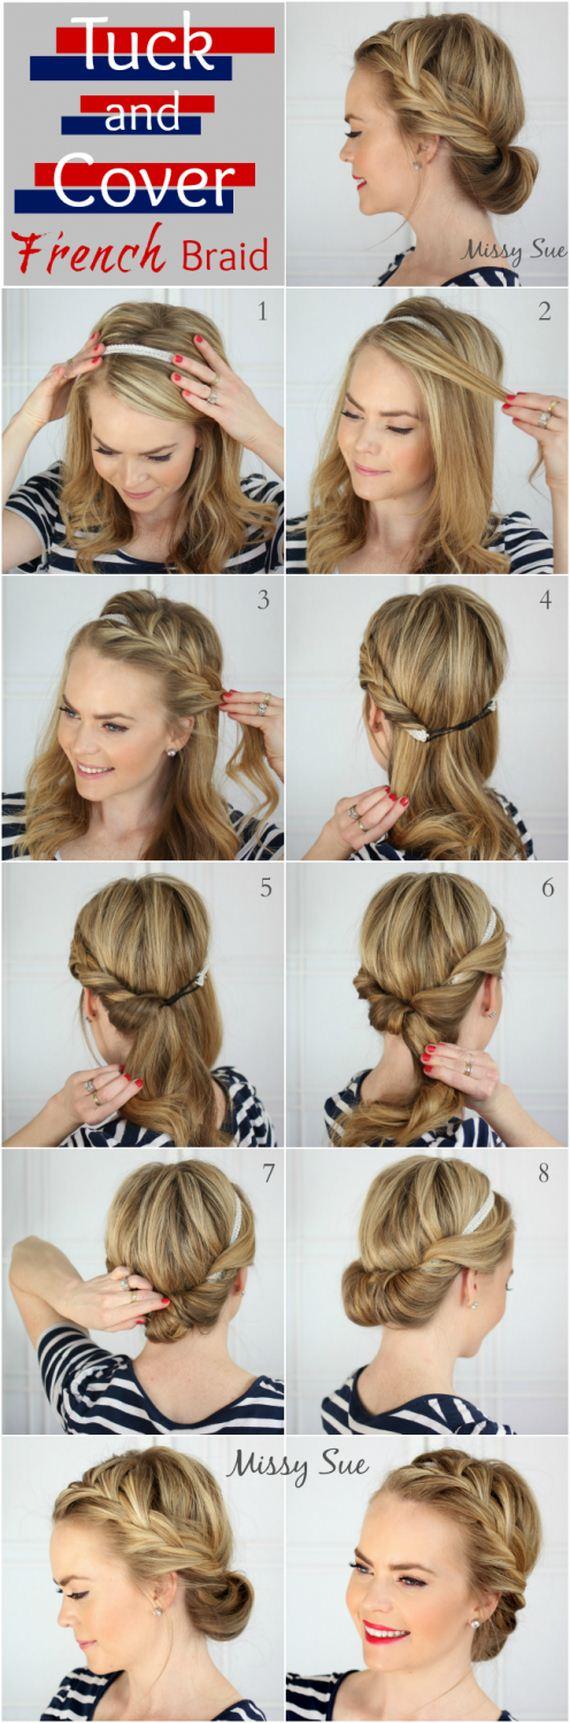 04-DIY-Hairstyles-for-Long-Hair